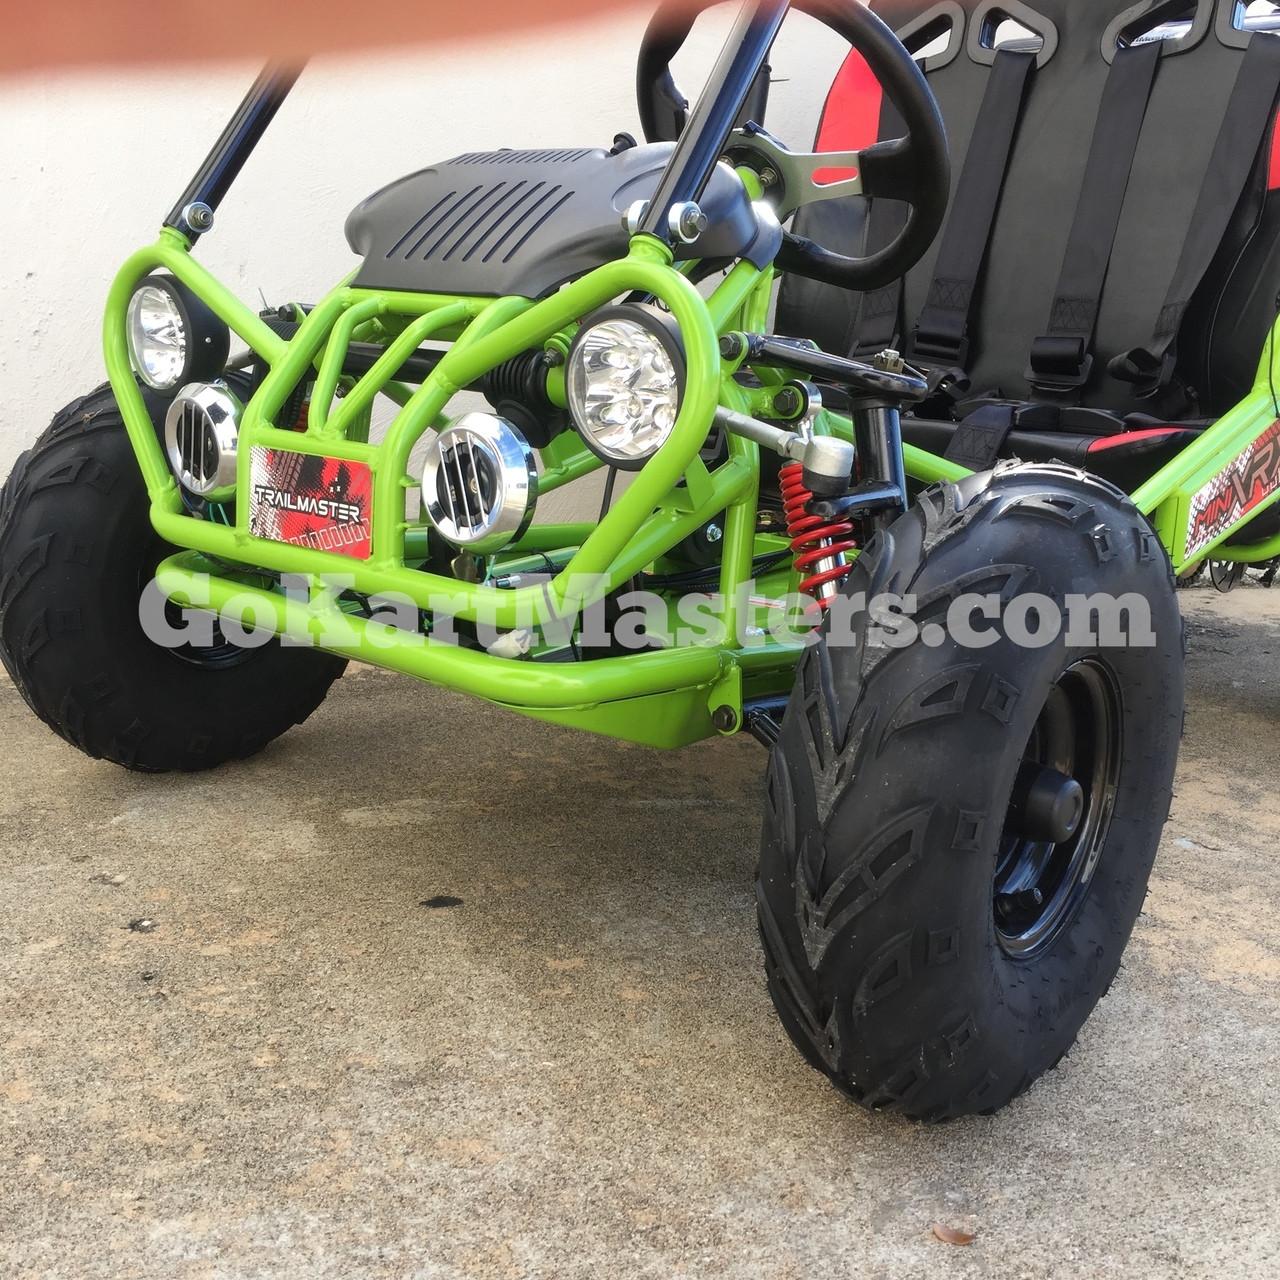 XTRM Kinder Kart-Rennanzug Camo Pink Junior Motocross Kinder Quad Dirt Bike MX Offroad Trials Go-Karting Enduro Kinder ATV MTB BMX Sport Overall Racing Einteiliger Anzug